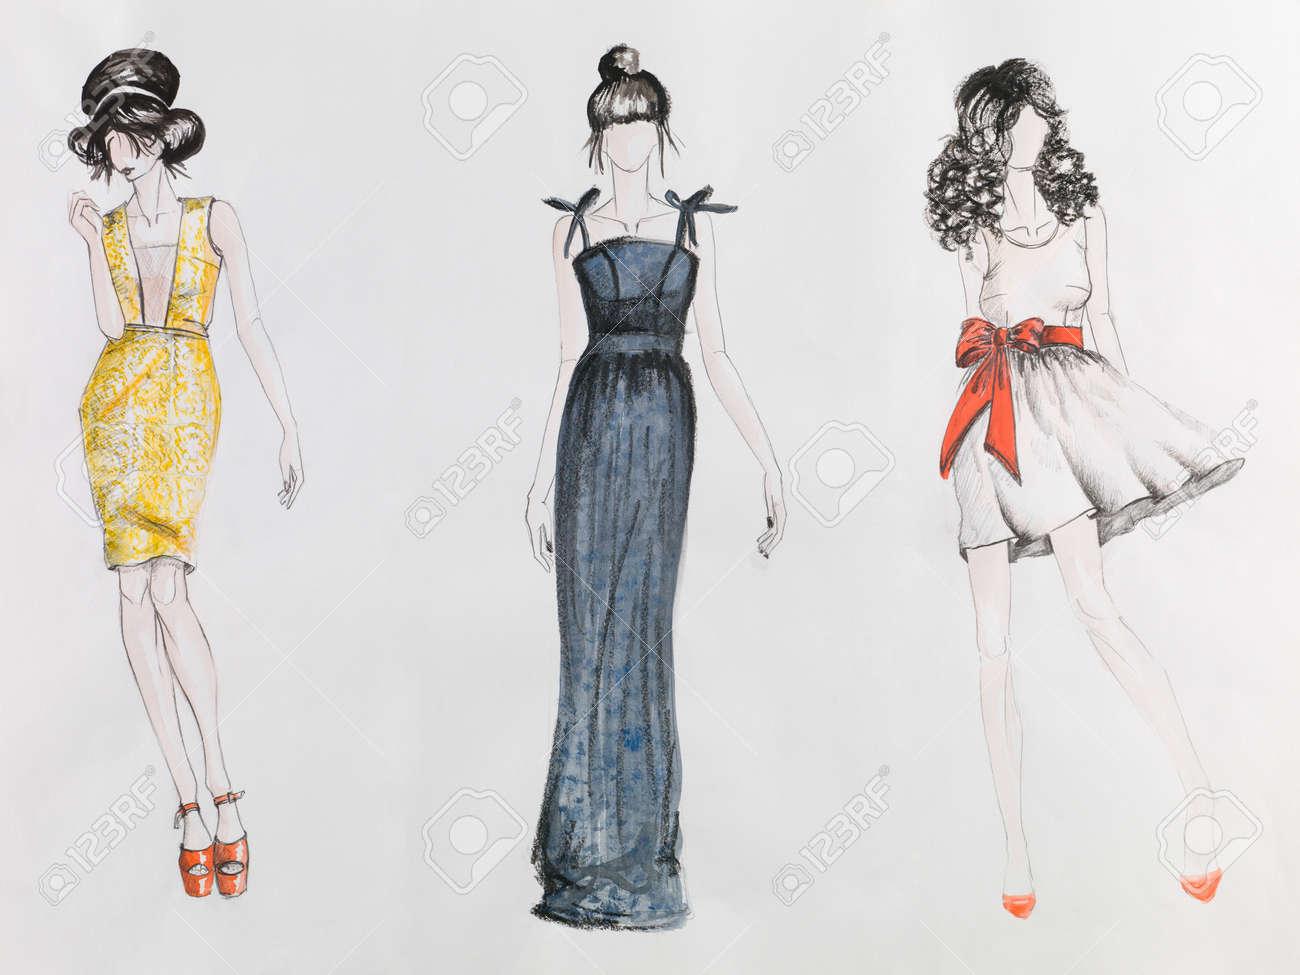 Dibujos De Chicas Con Vestidos Para Dibujar ᐈ Vestido Largo